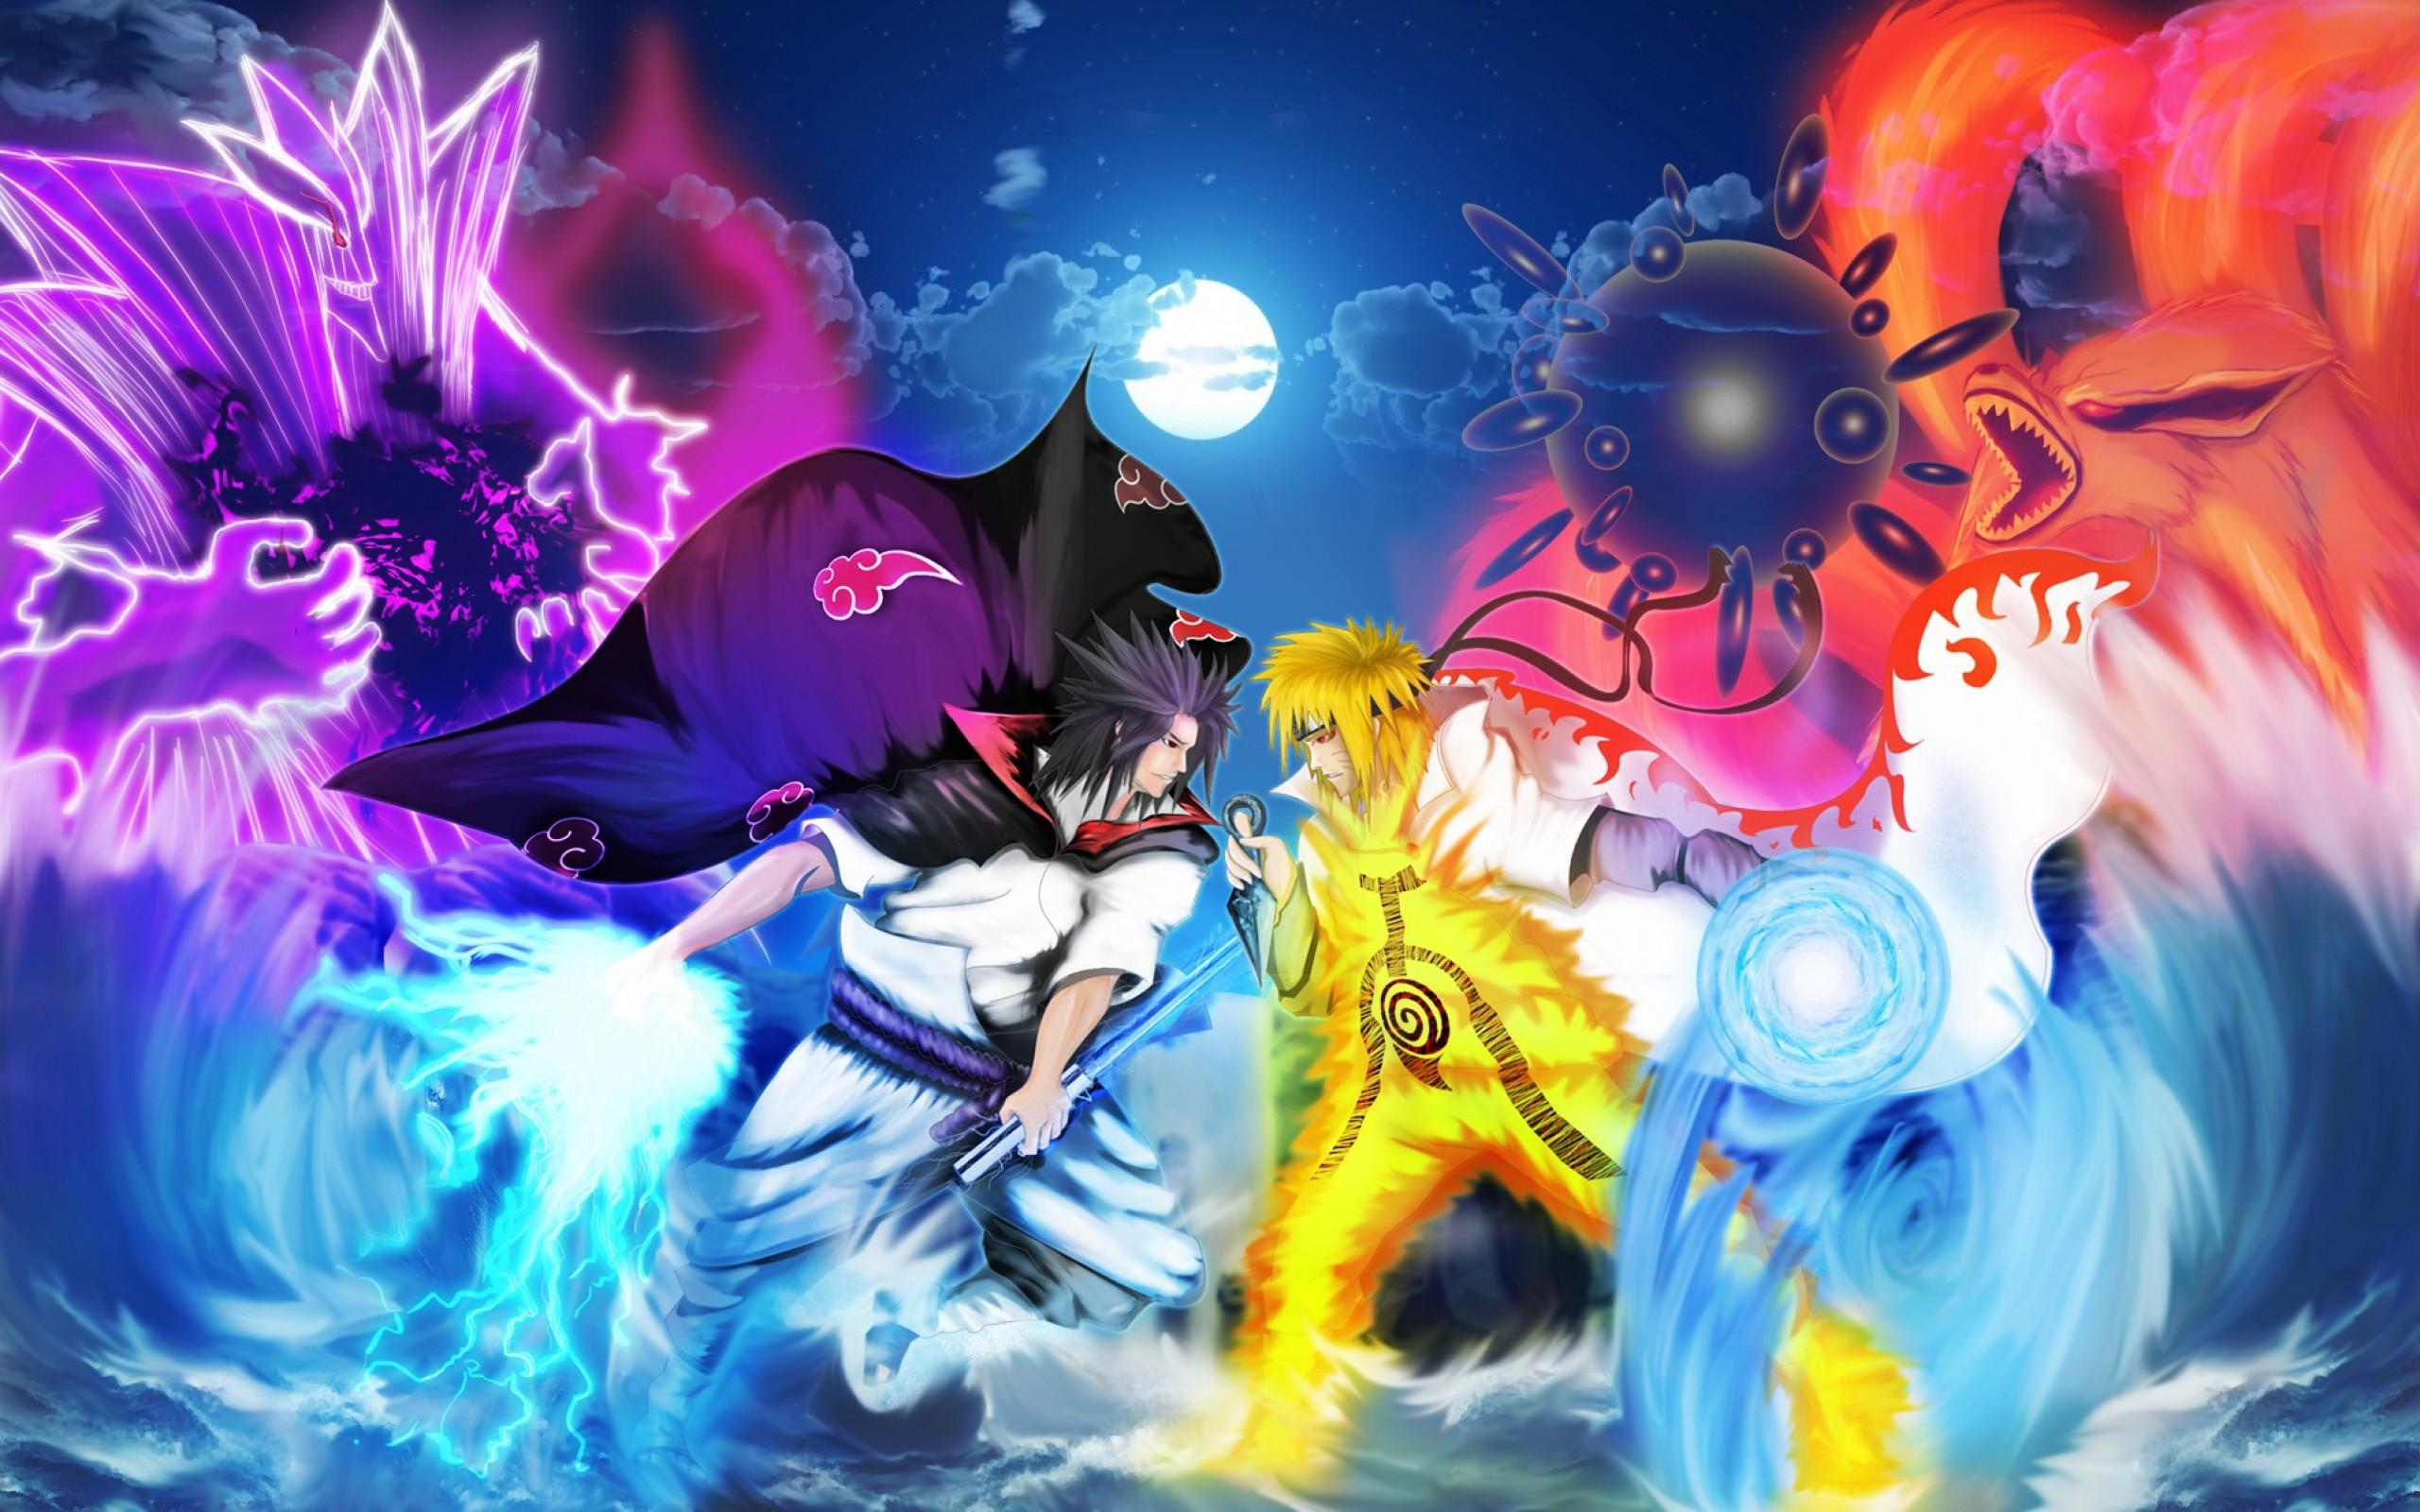 Fantastic Wallpaper Naruto Ipad - 1071263-widescreen-sasuke-susanoo-wallpaper-2560x1600-ipad-retina  Graphic_31786.jpg